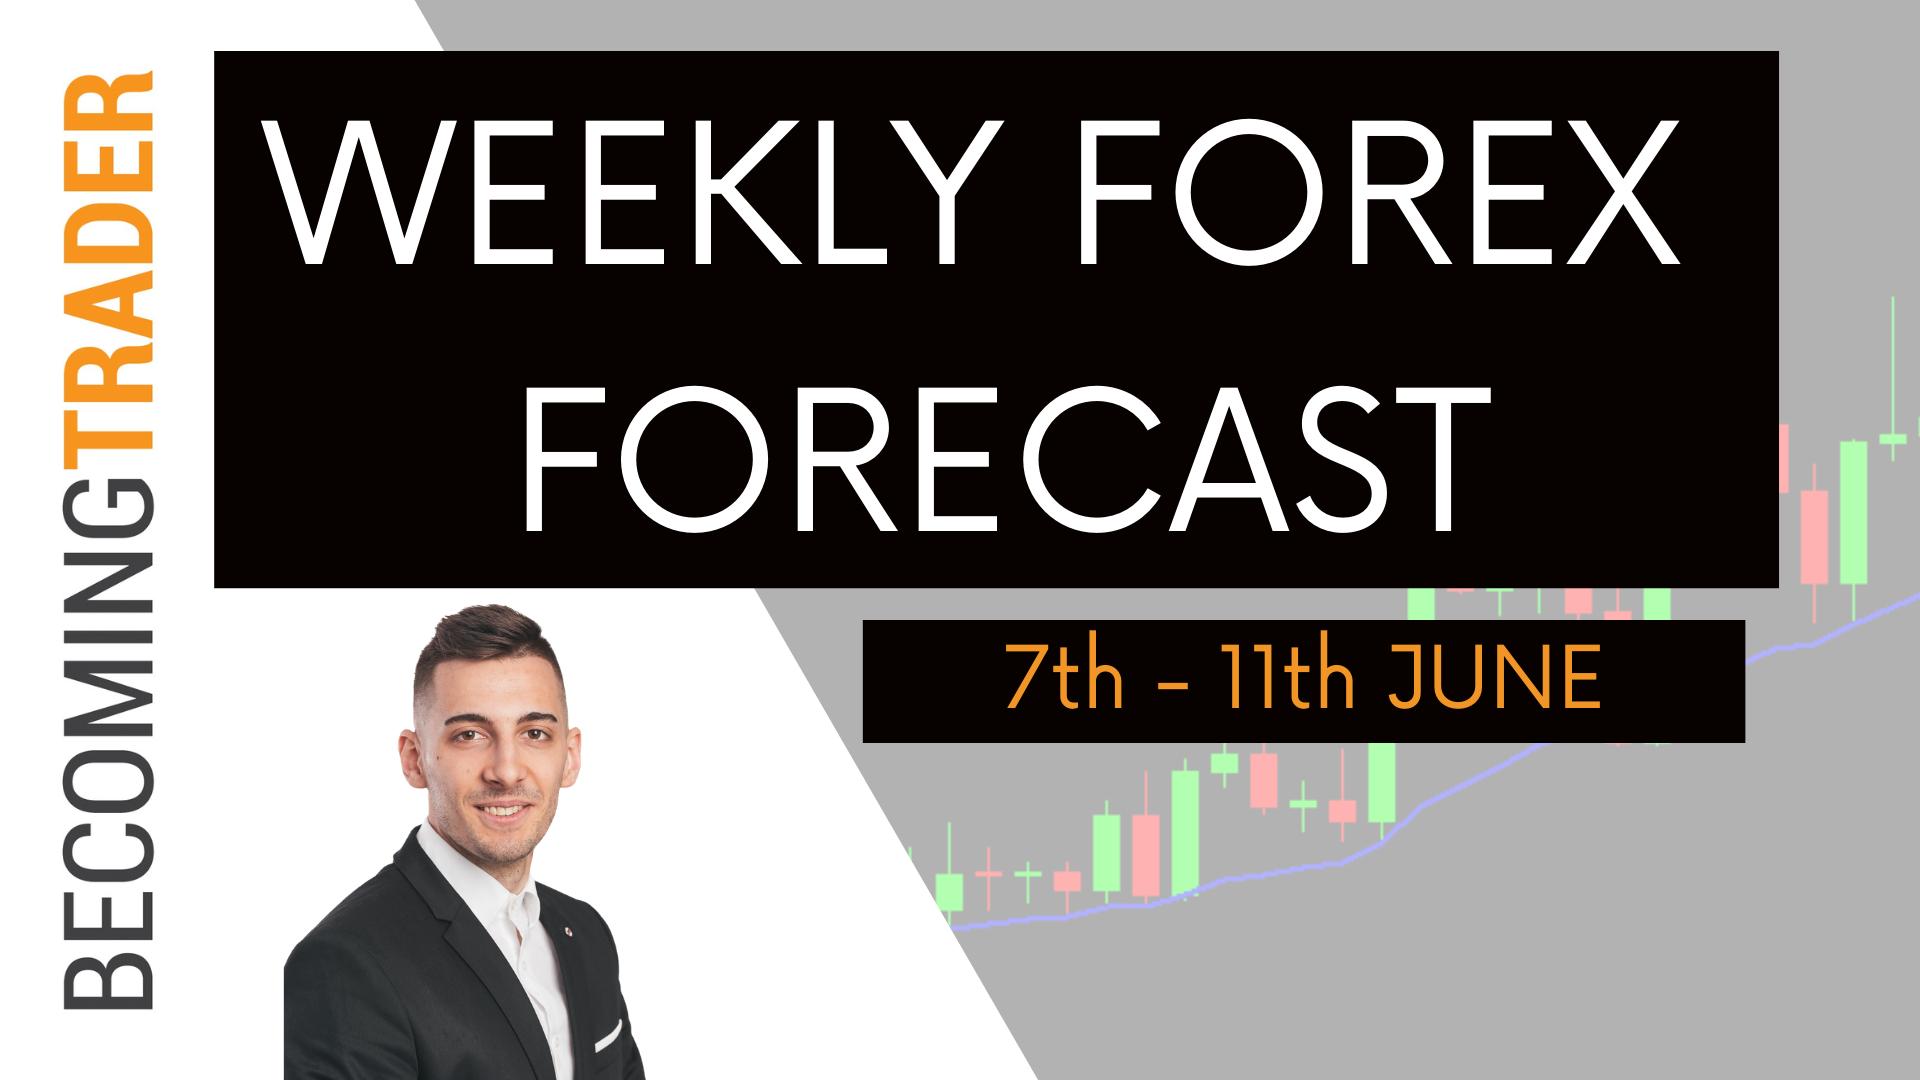 Weekly Forex Forecast 7th to 11th June 2021 | EURUSD , GBPUSD , AUDUSD , NZDUSD , USDCAD , USDJPY